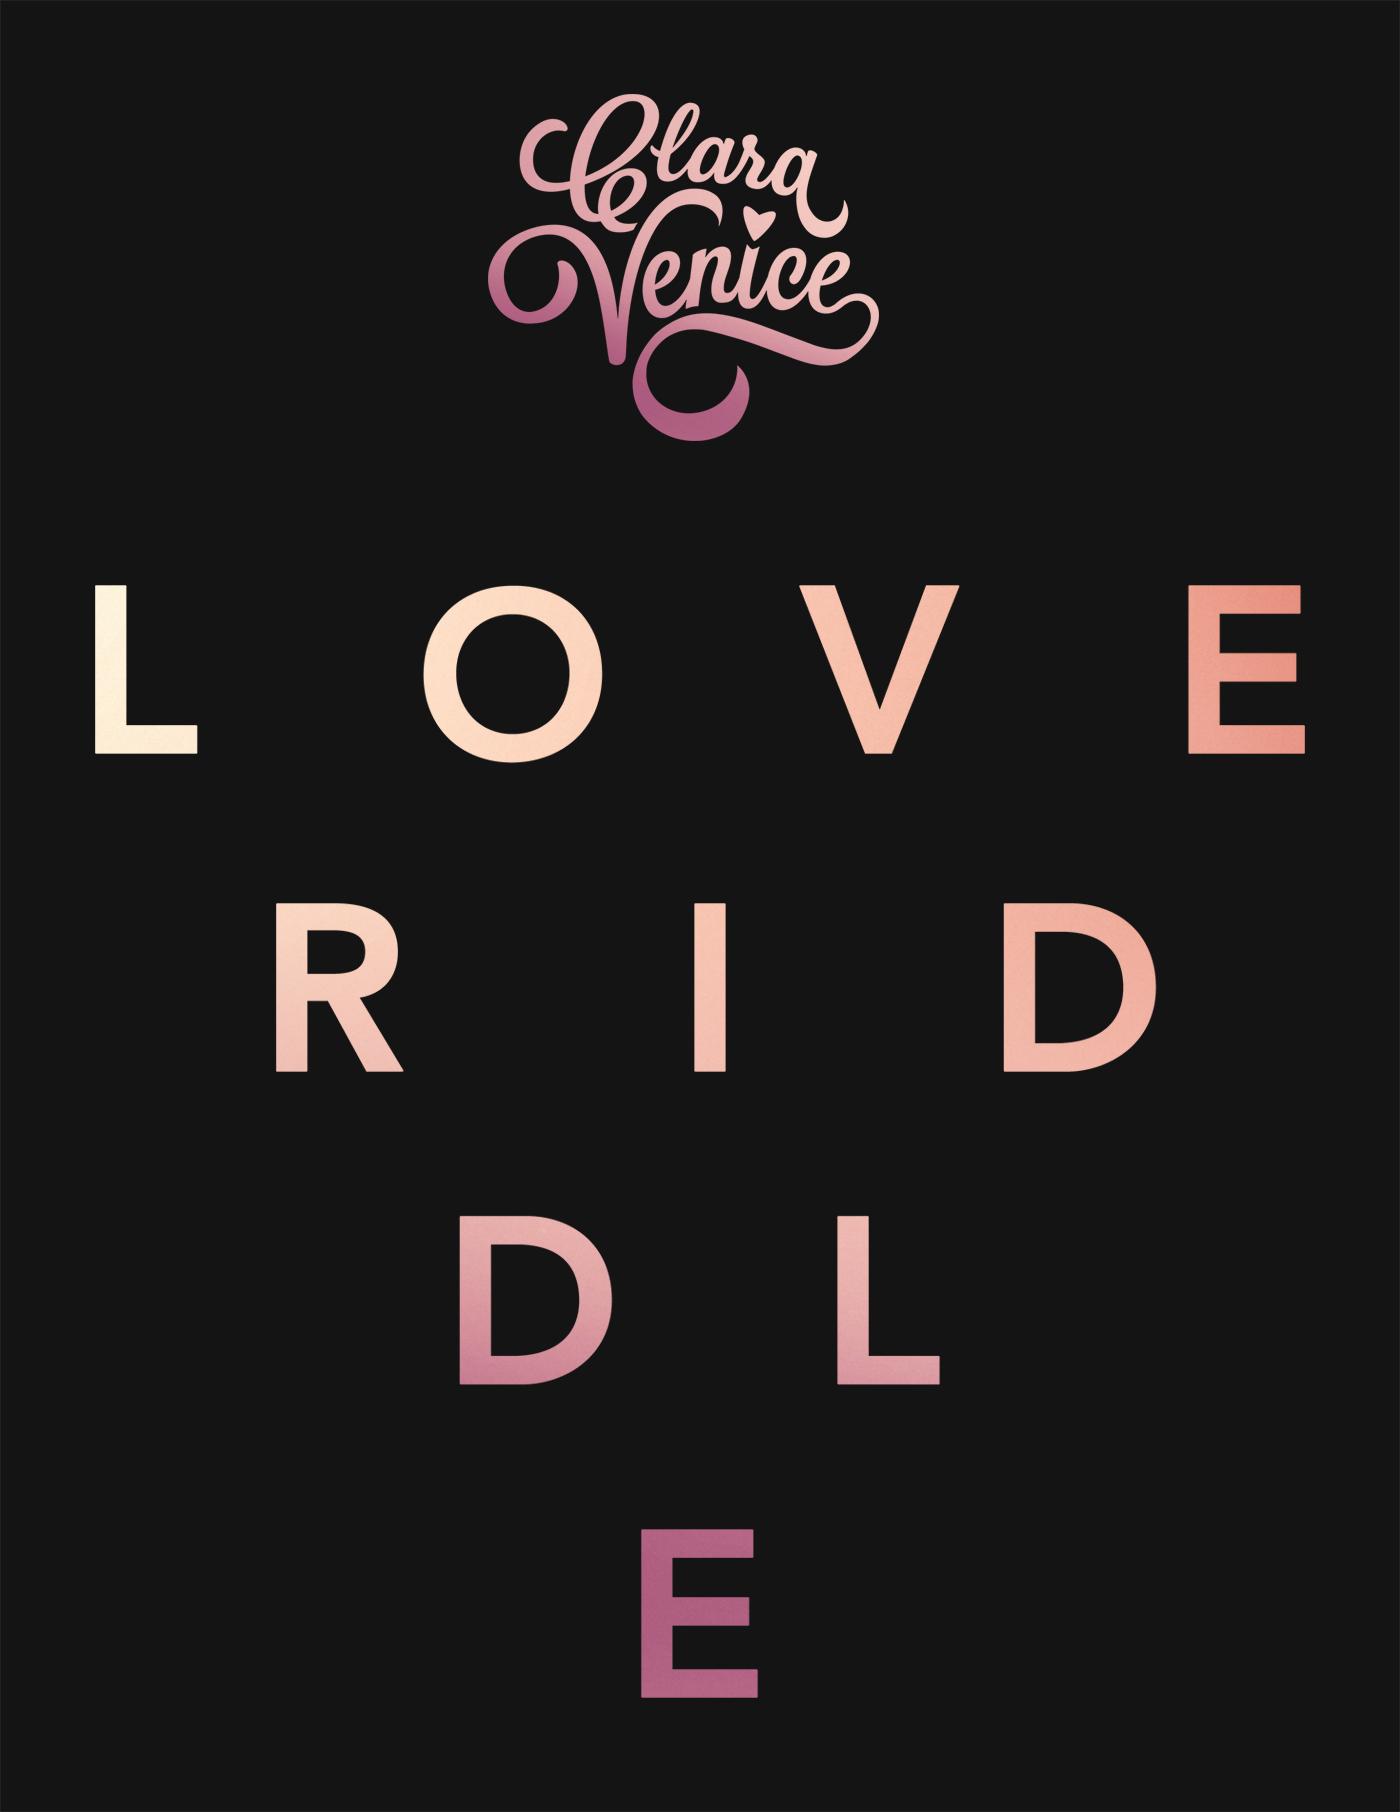 loveRiddle.jpg